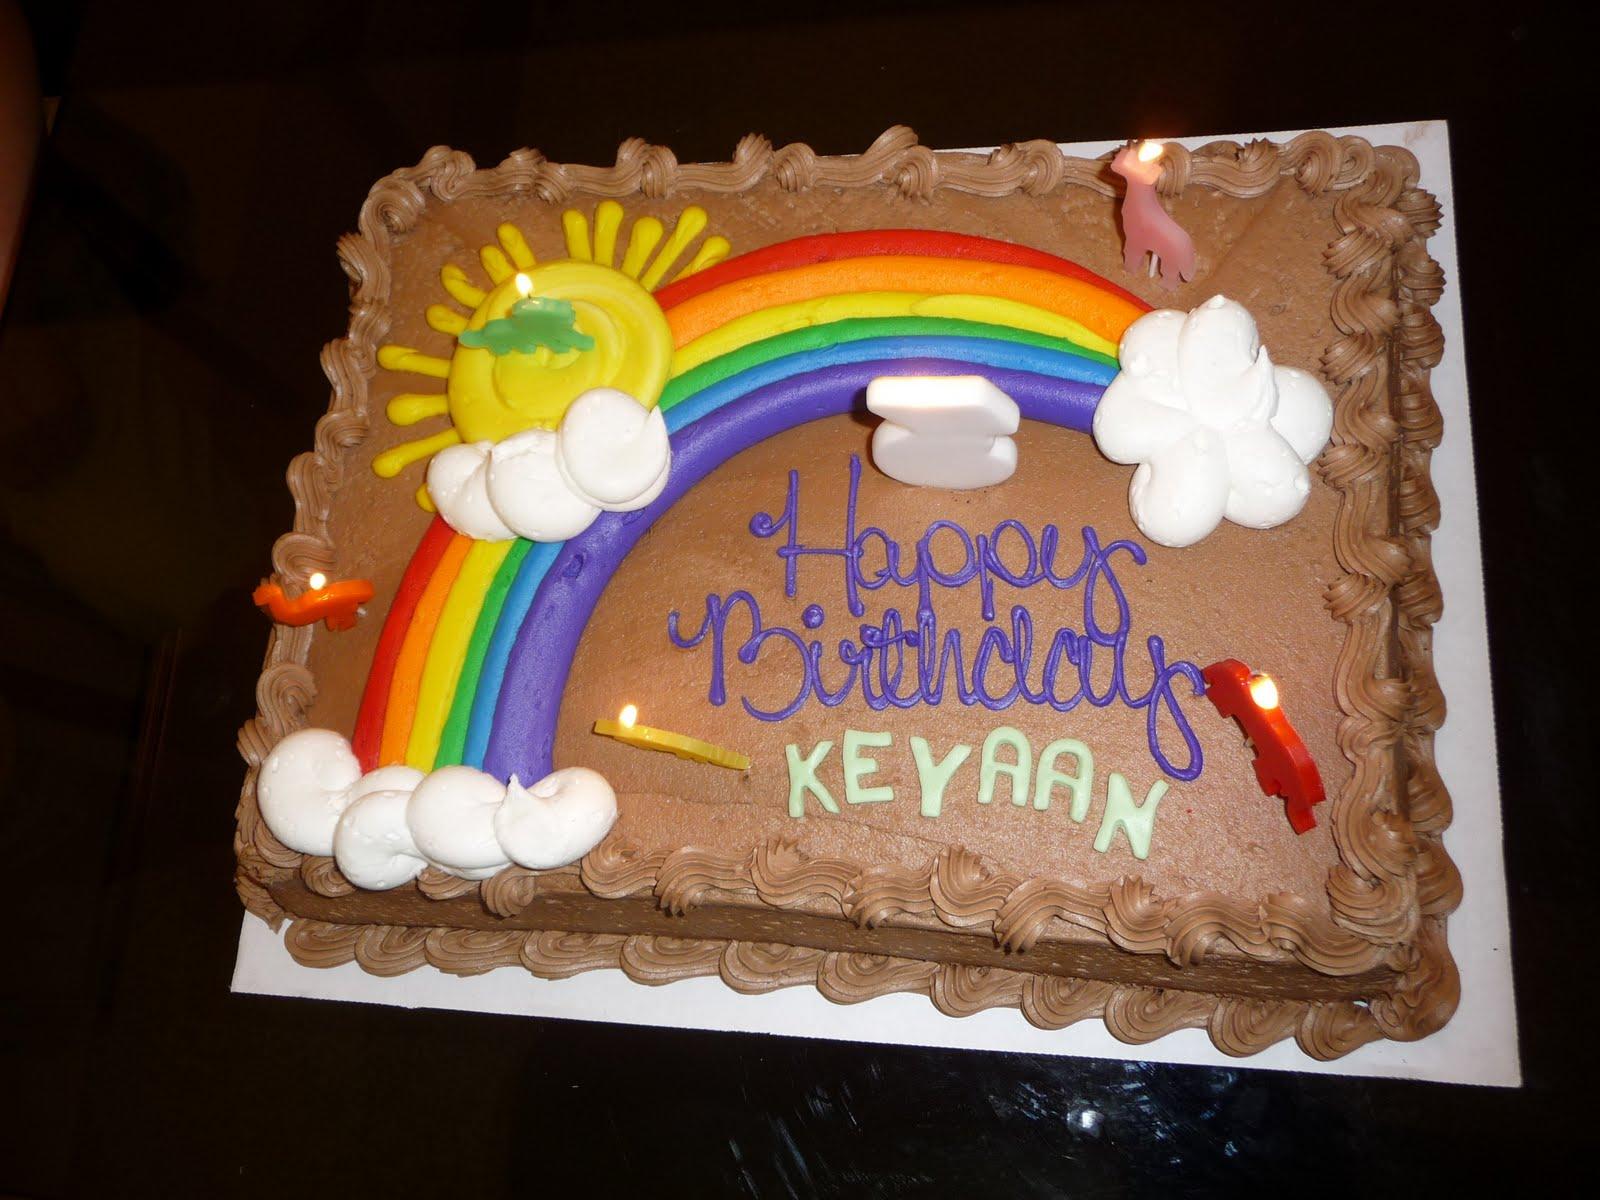 Enjoyable 7 First Birthday Cakes Costco Photo Costco Birthday Cakes Funny Birthday Cards Online Alyptdamsfinfo